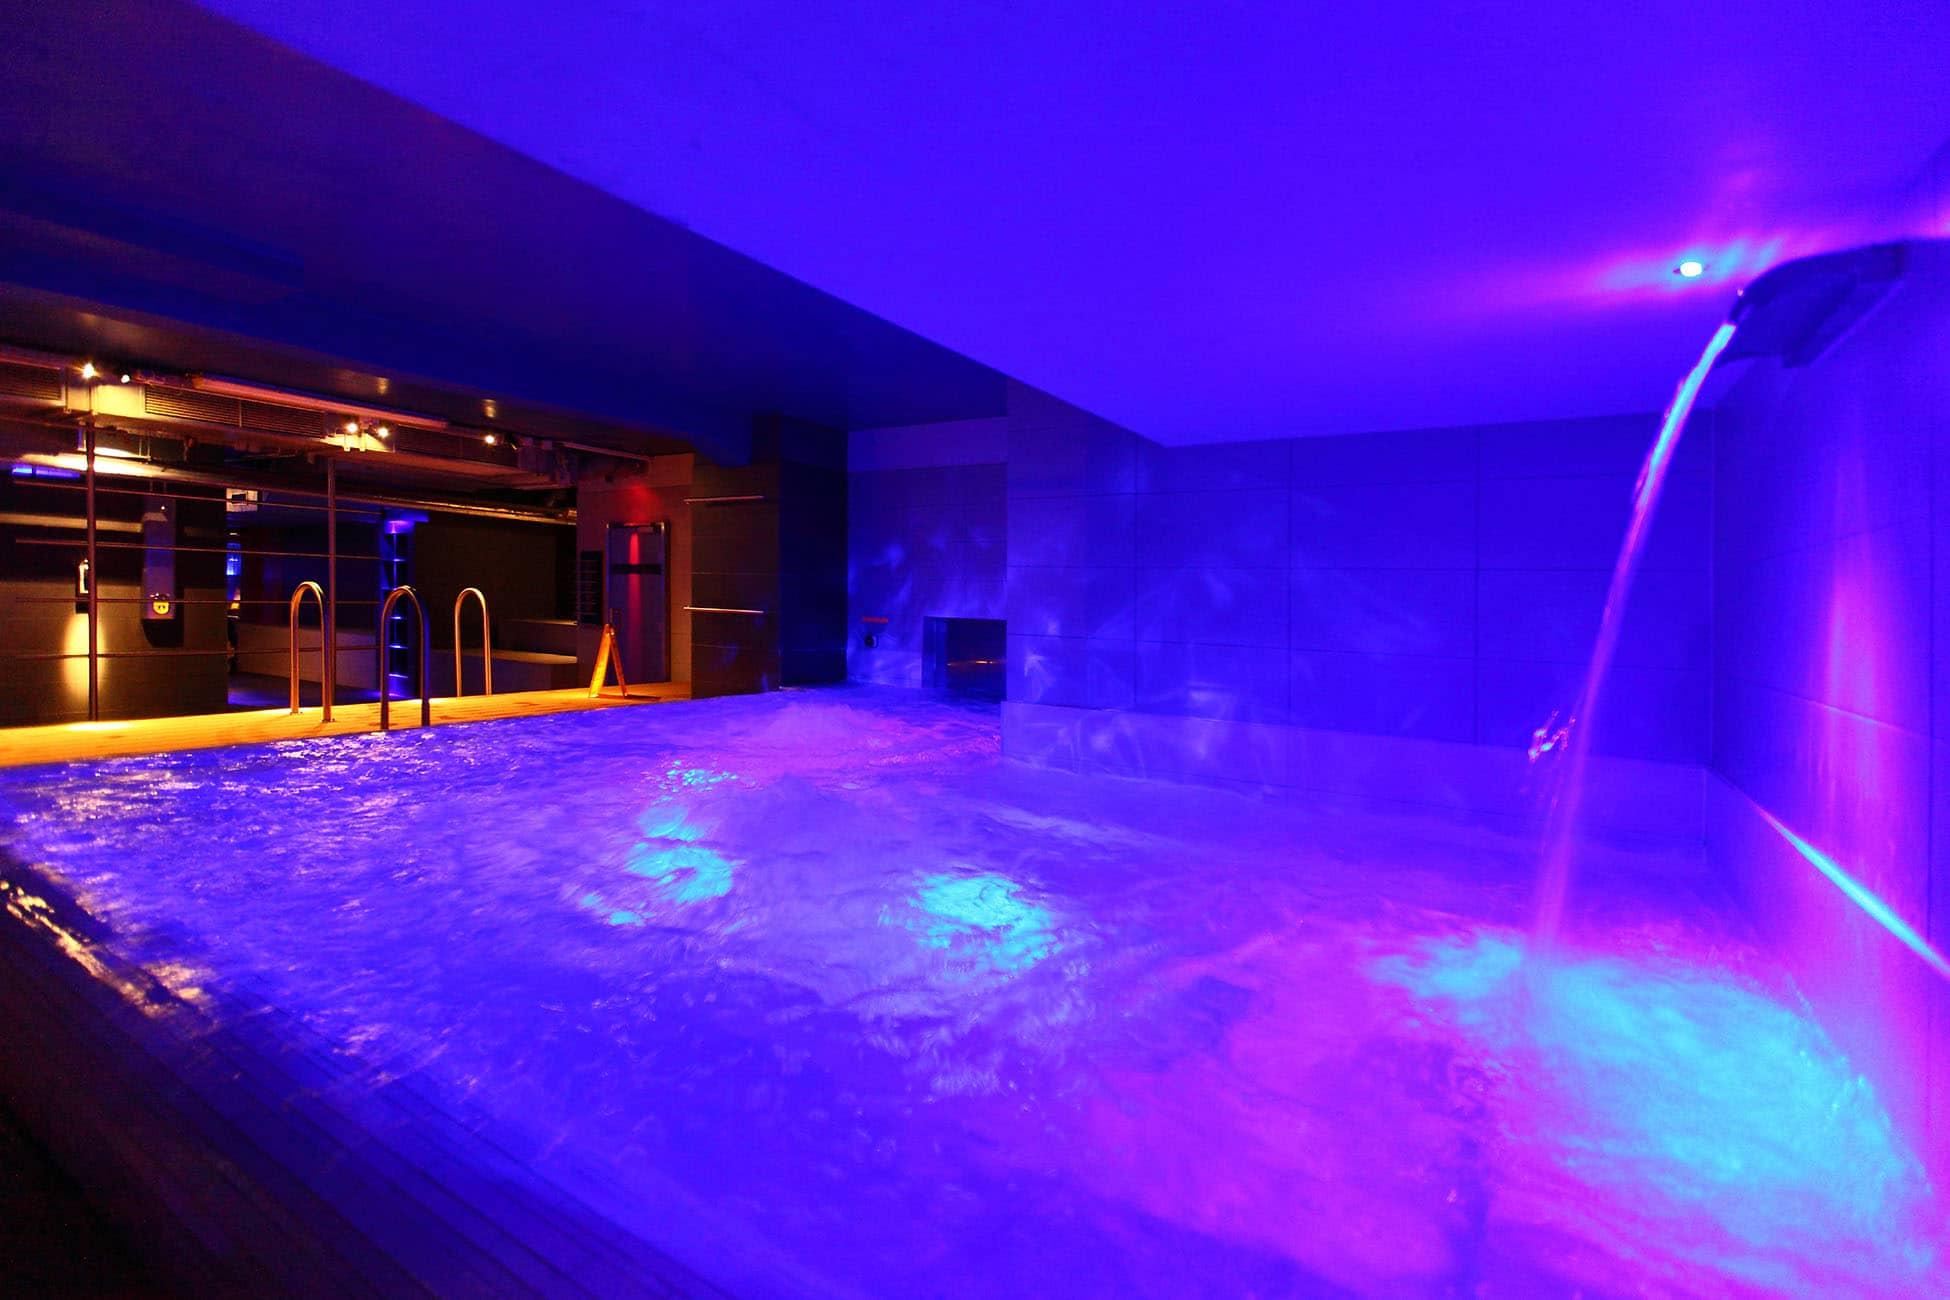 Boiler Sauna Berlin Erfahrungen & Bewertungen auf Planet-Randy